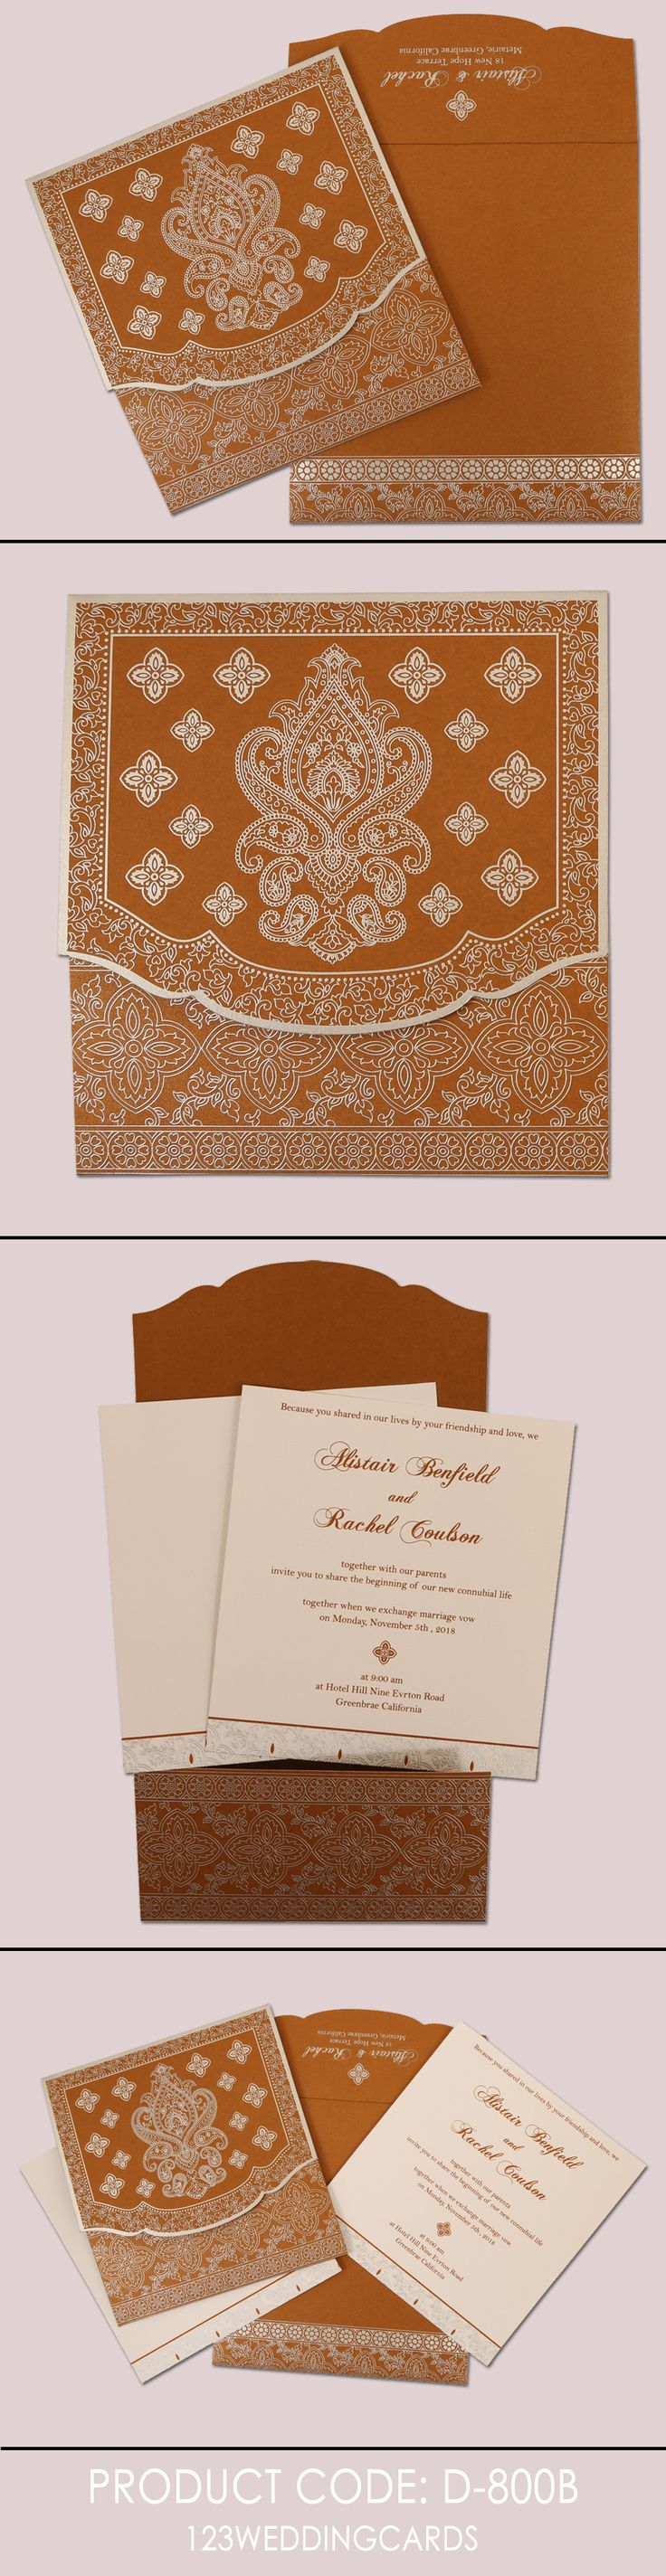 matter for wedding invitation in gujarati%0A Shimmery screen printed wedding invitations   in   b